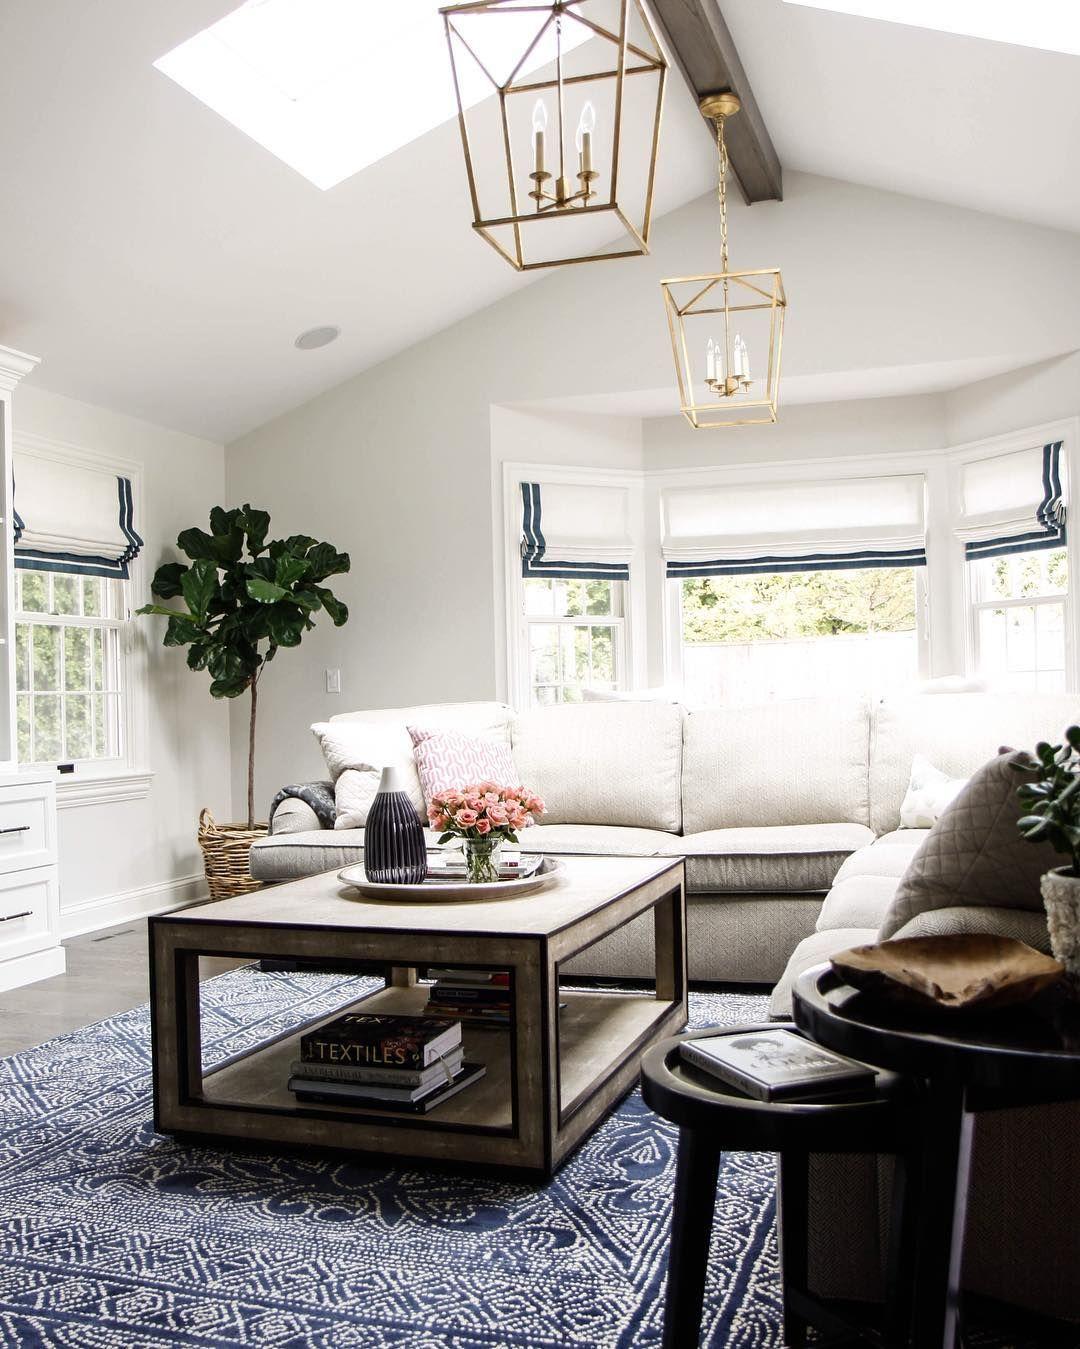 interior design studio blog chicago area renee disanto christina rh pinterest com Interior Design Jobs Ligh Pipe Interior Design Blog